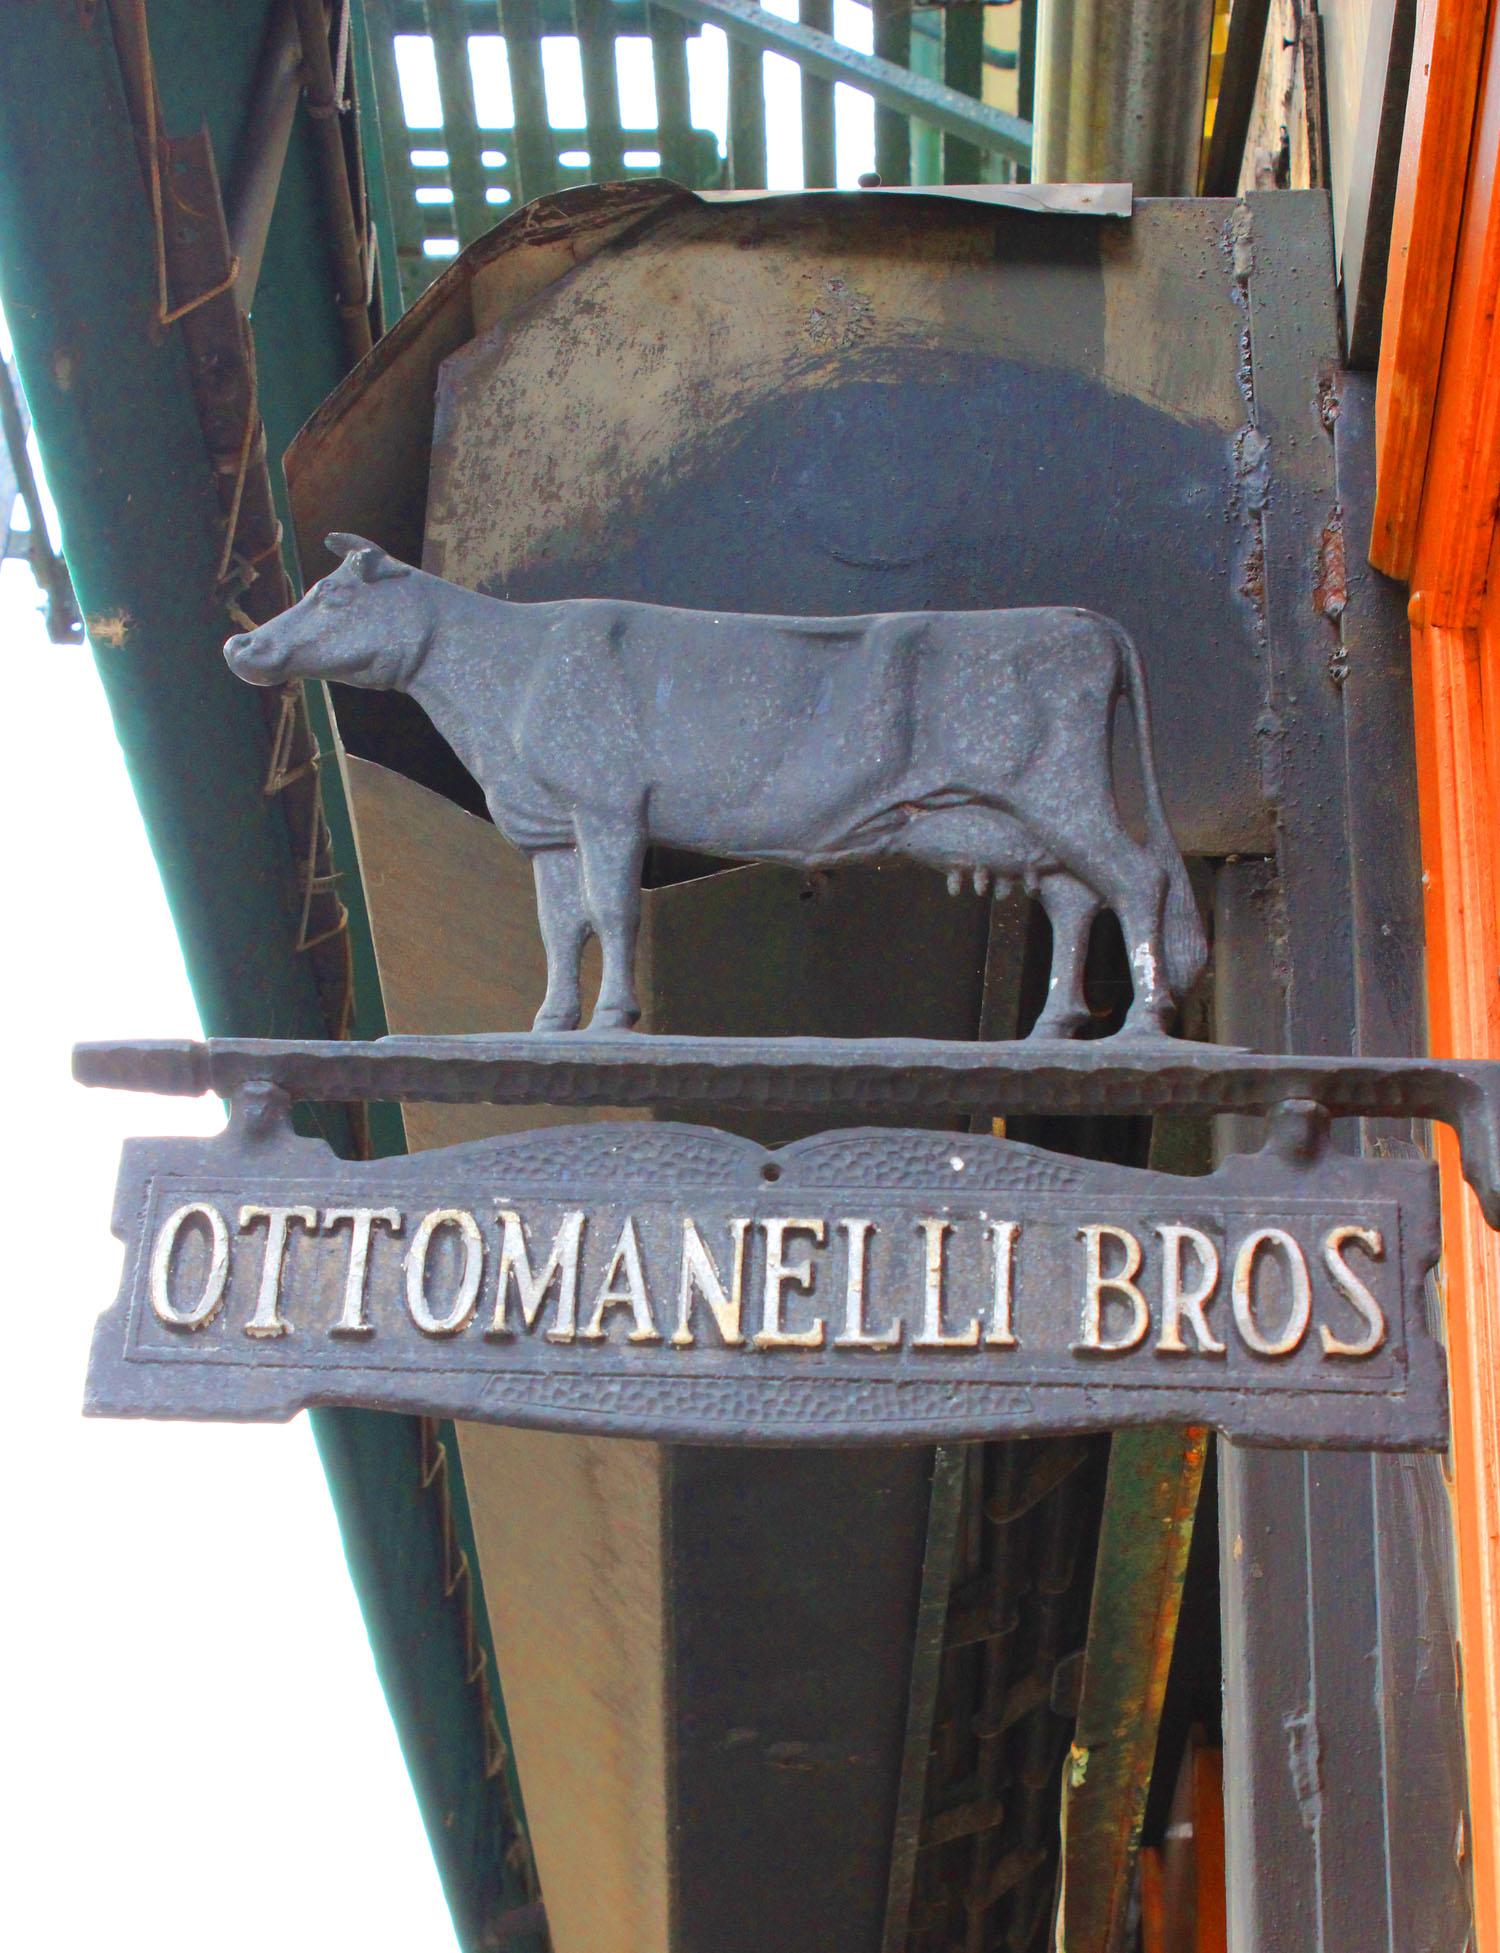 Ottomanelli Bros. Butcher  | Image:  Laura Messersmith